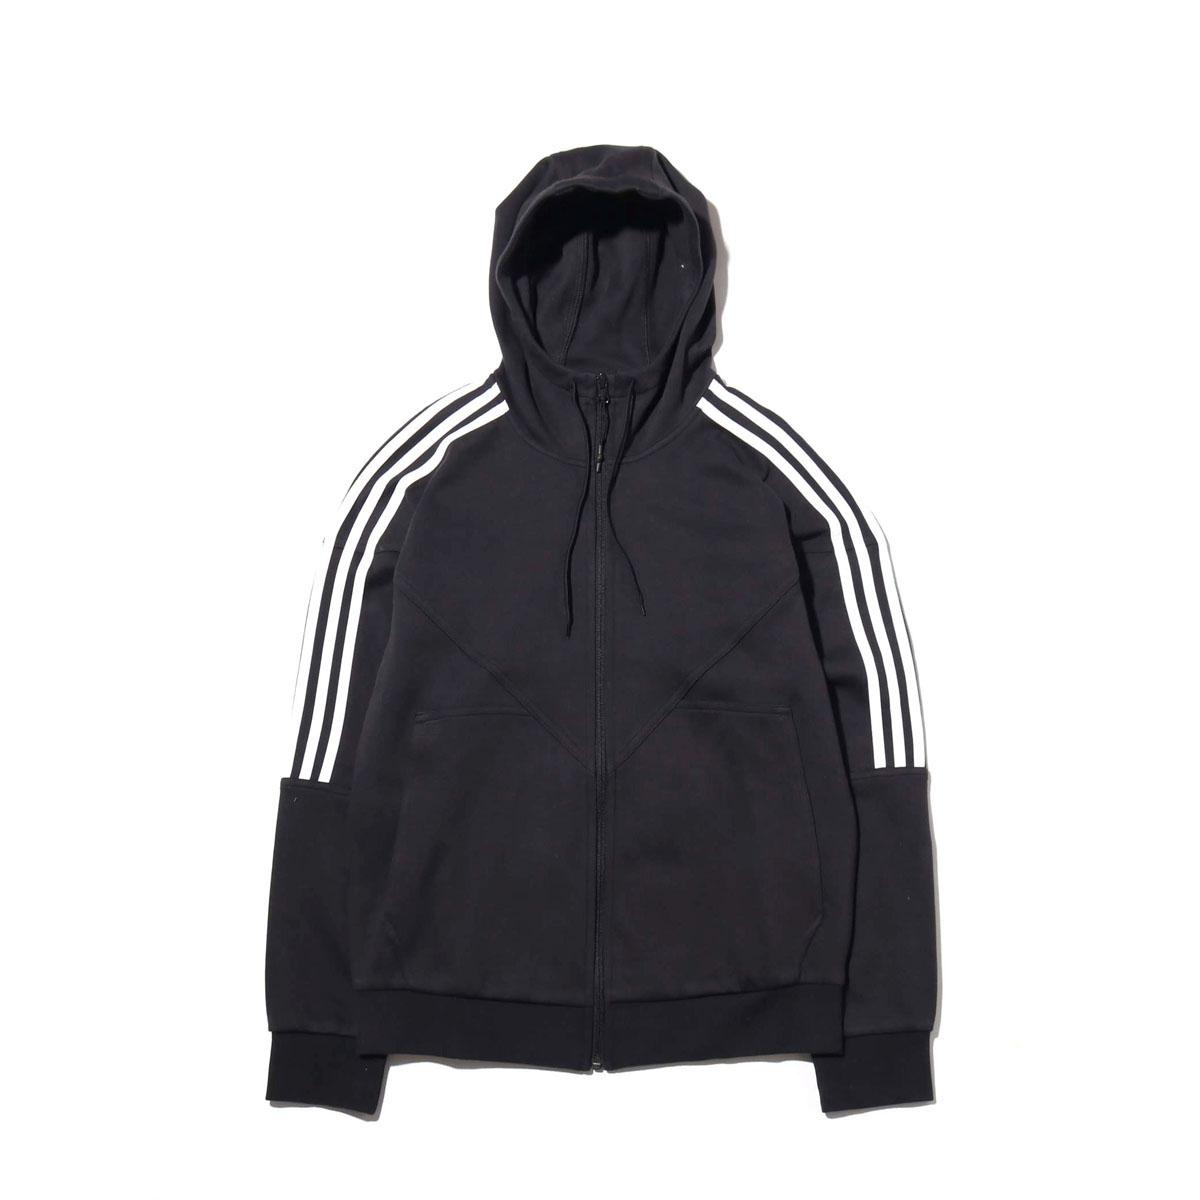 adidas Originals NMD FZ HOODIE(アディダス オリジナルス エヌエムディーFZフーディー)BLACK【メンズ パーカー】18FA-I